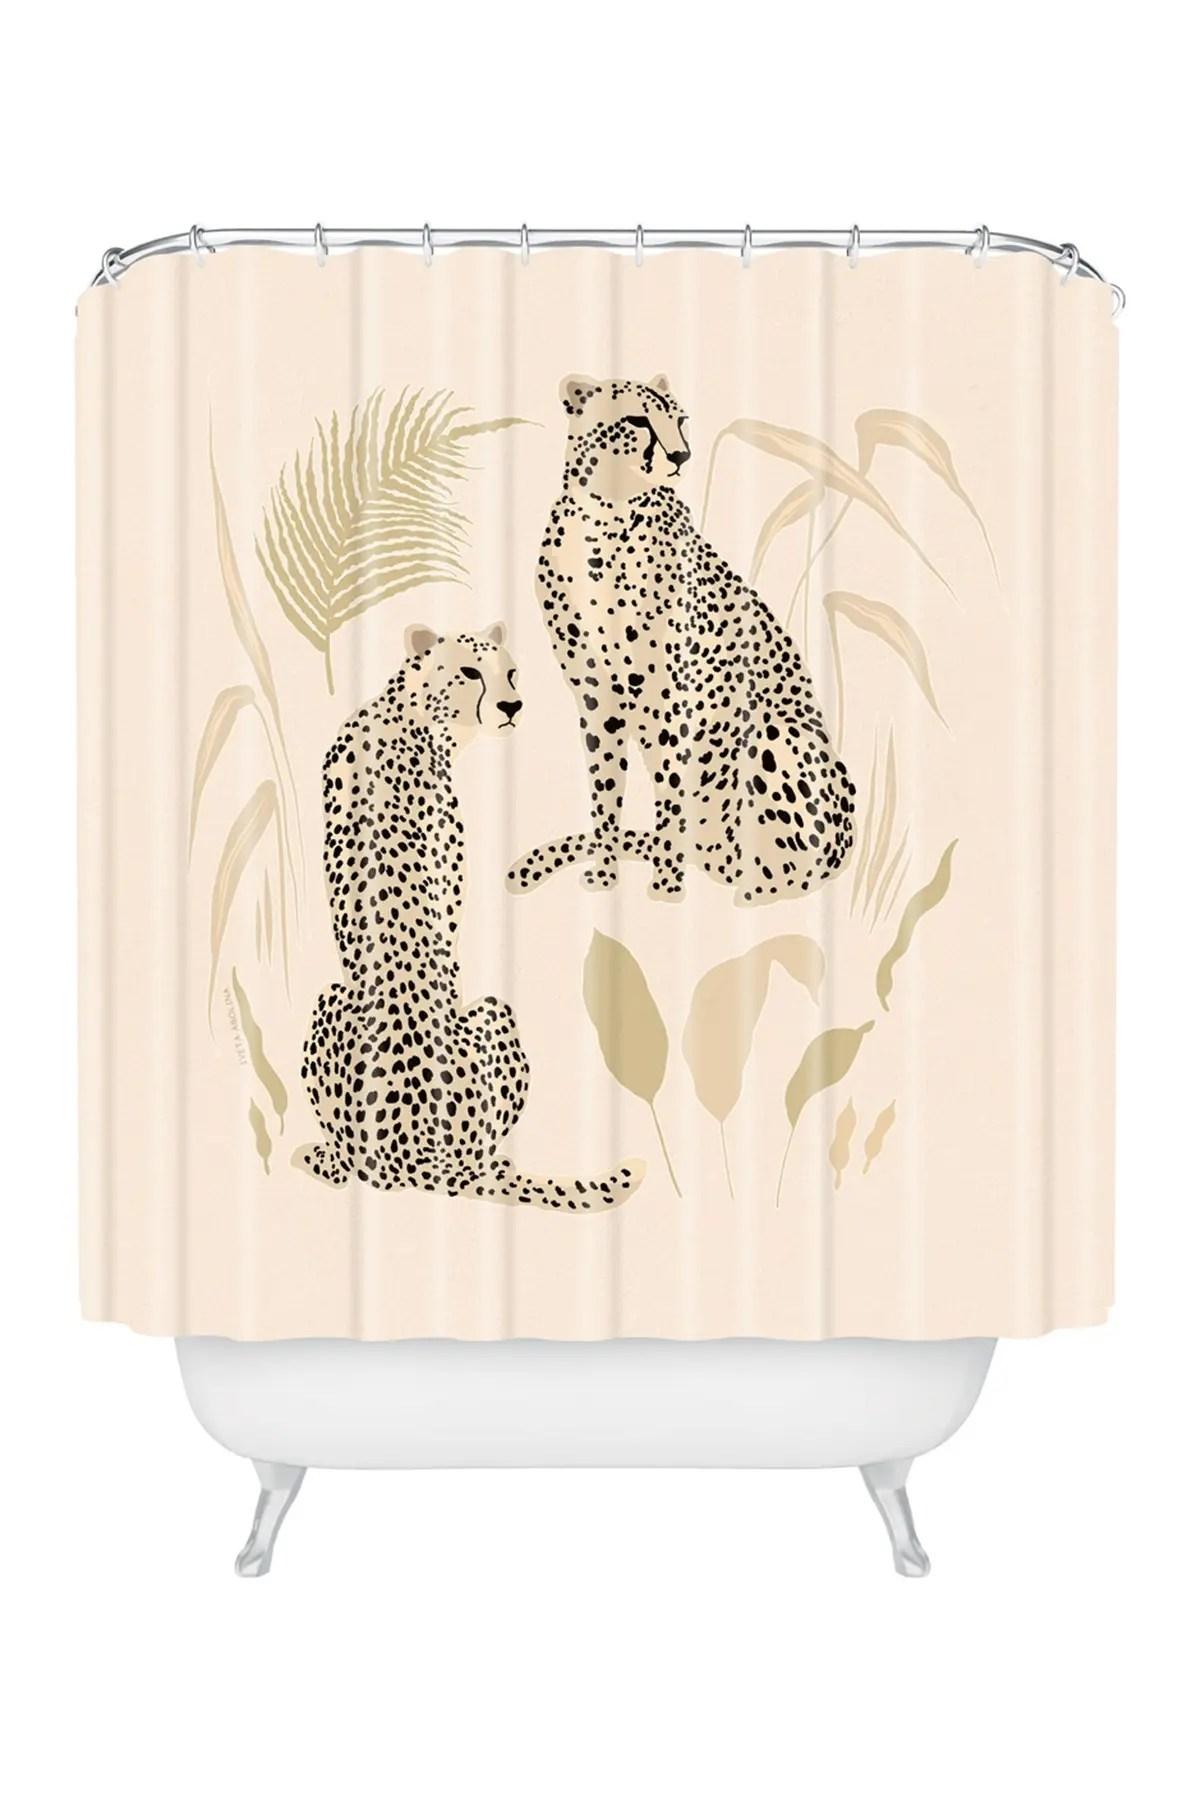 deny designs iveta abolina aguirre cheetahs shower curtain nordstrom rack